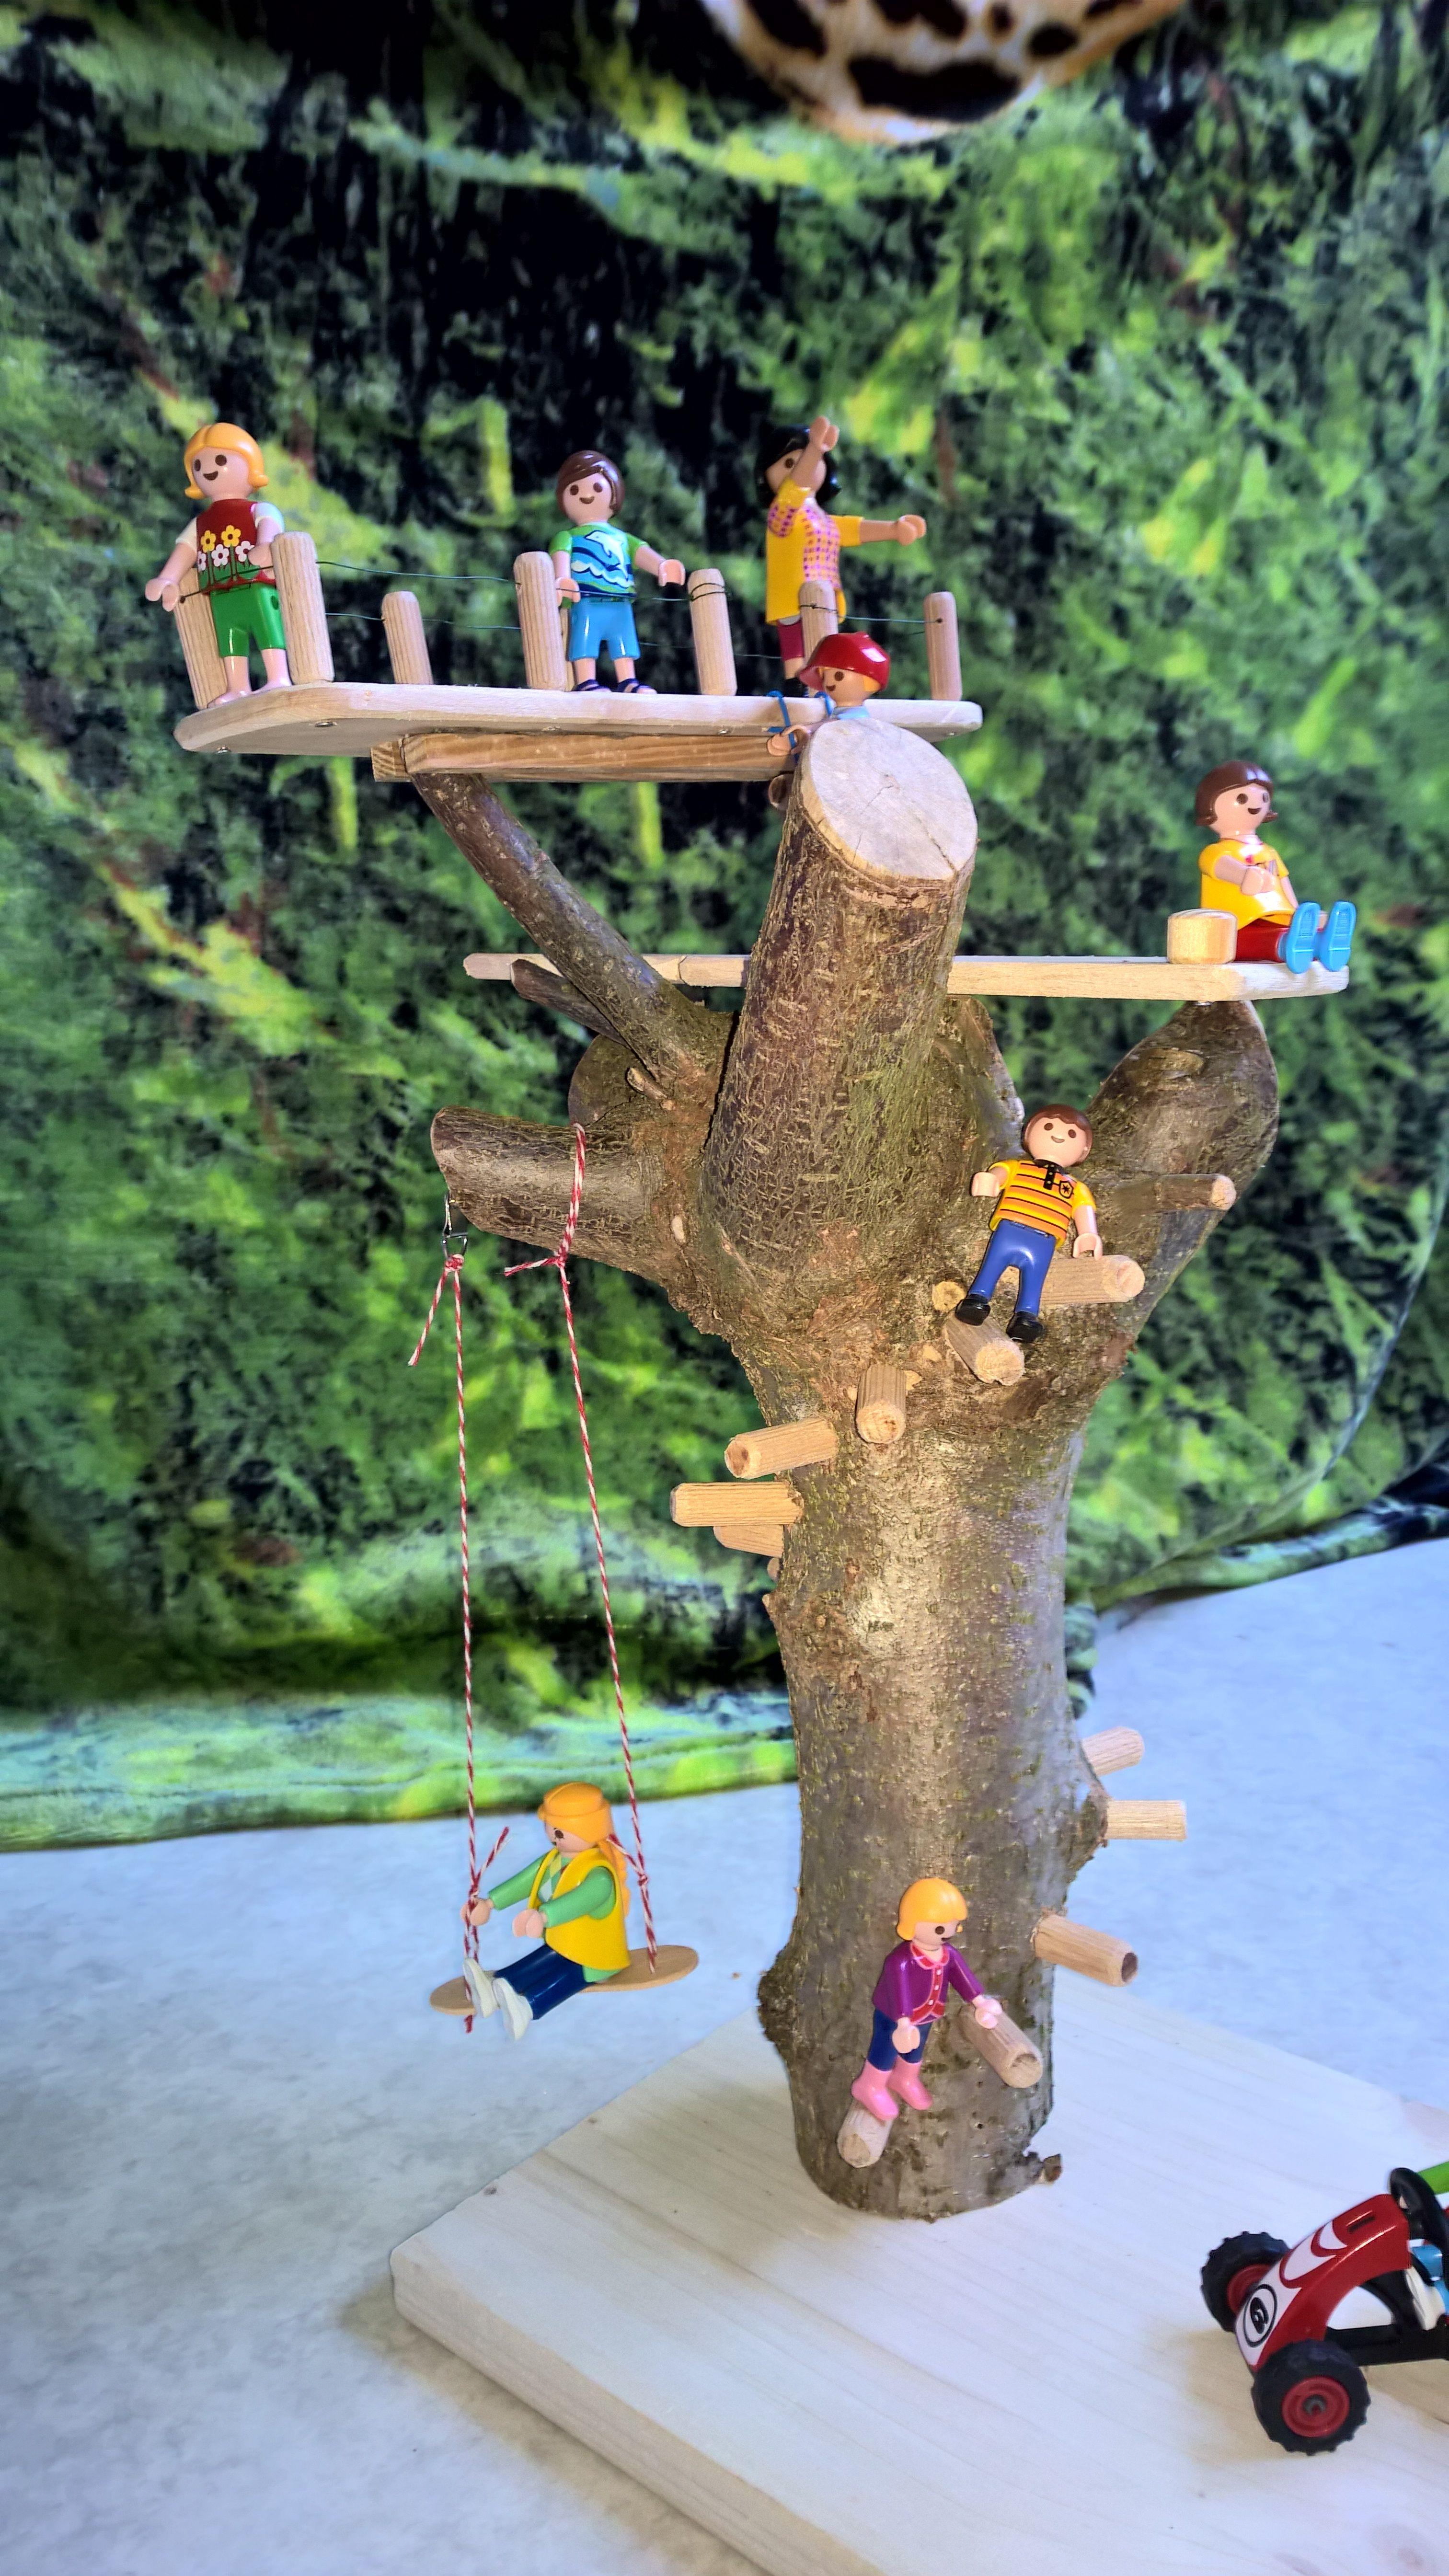 diy cabane dans les arbres pour playmobils playmobil pinterest les arbres diy et playmobil. Black Bedroom Furniture Sets. Home Design Ideas